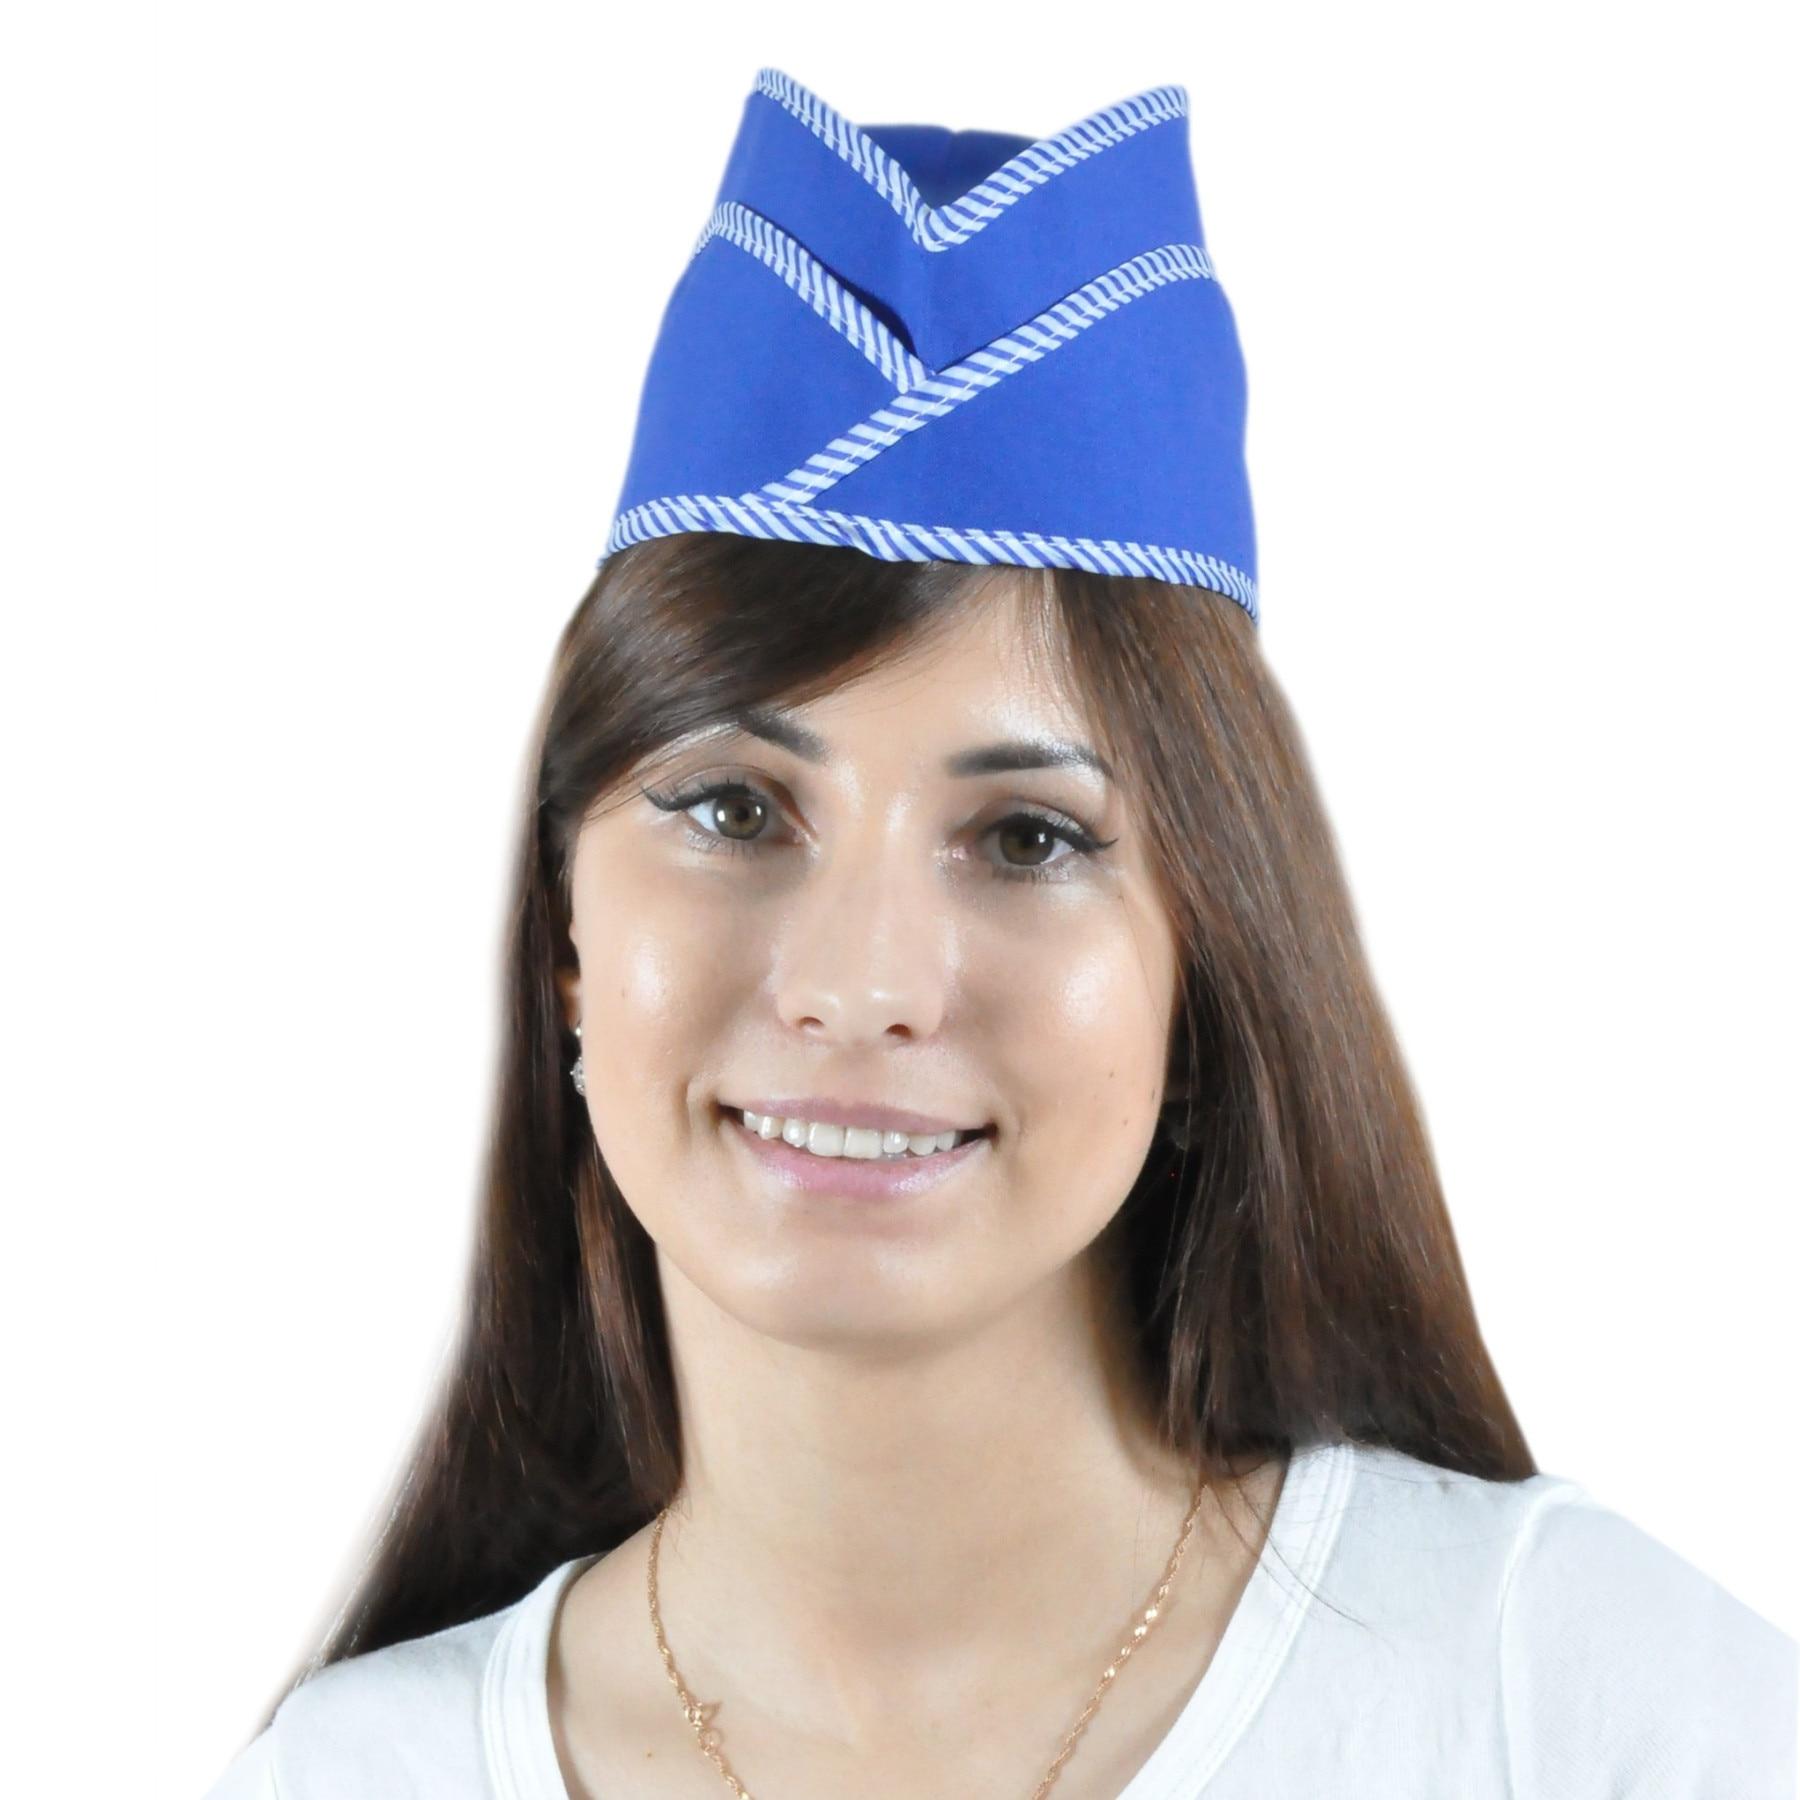 Piloto para el vendedor ivuniforma blue de gabardina